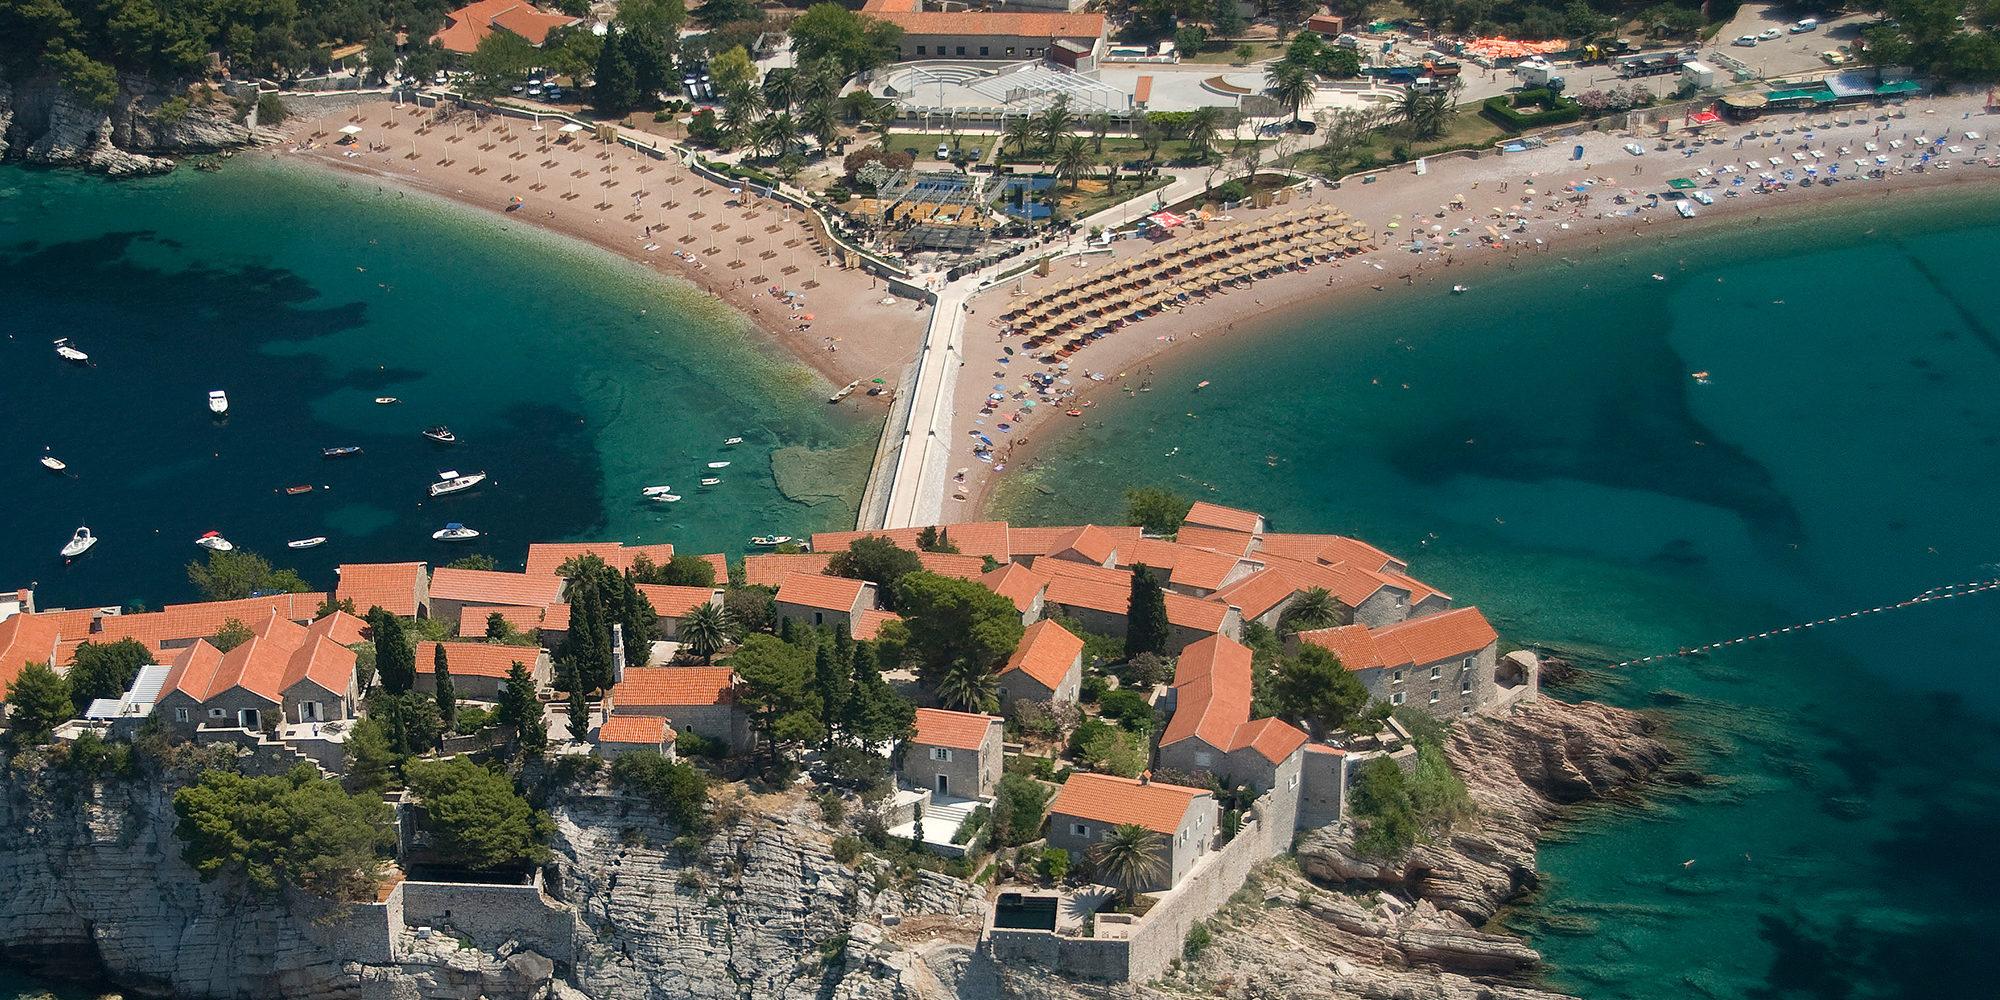 montenegro budva-beach budva-marina budva-hostels budva-caffes